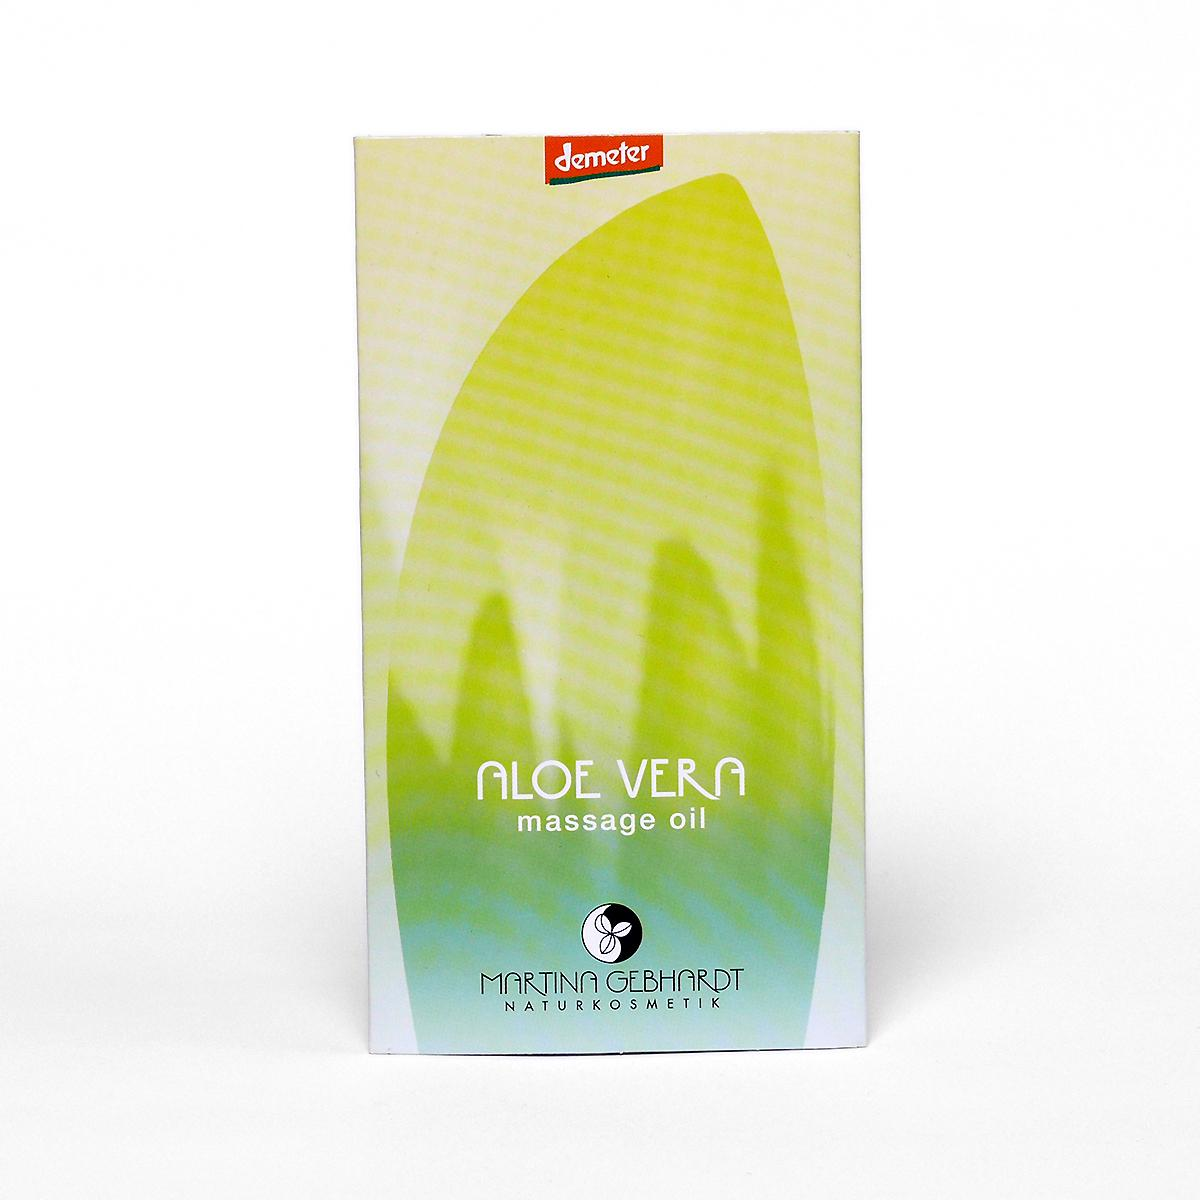 Martina Gebhardt Masážní olej aloe vera 2 ml